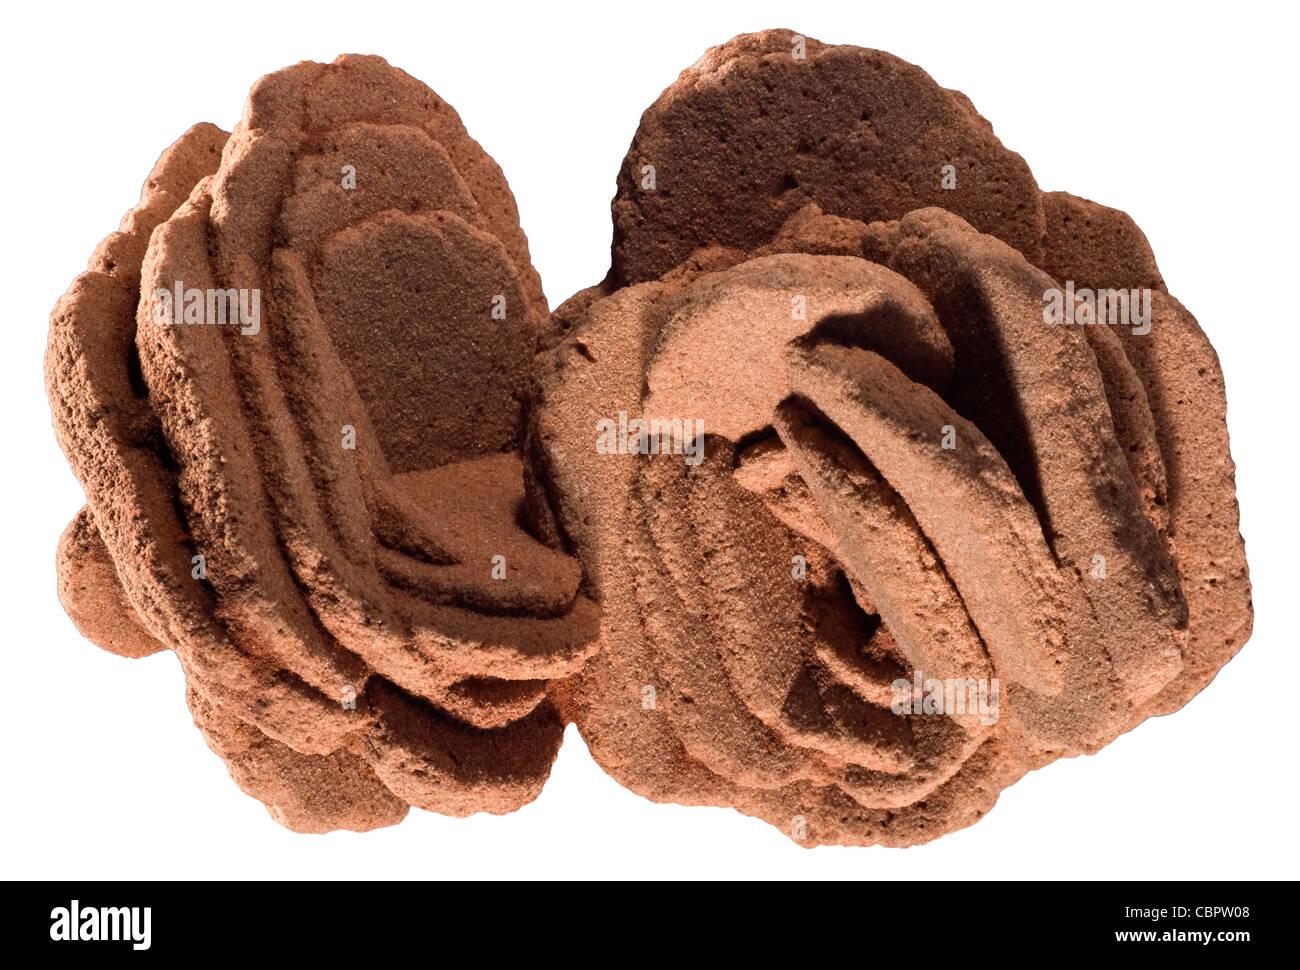 Barite 'Desert Rose' Norman, Oklahoma - Stock Image